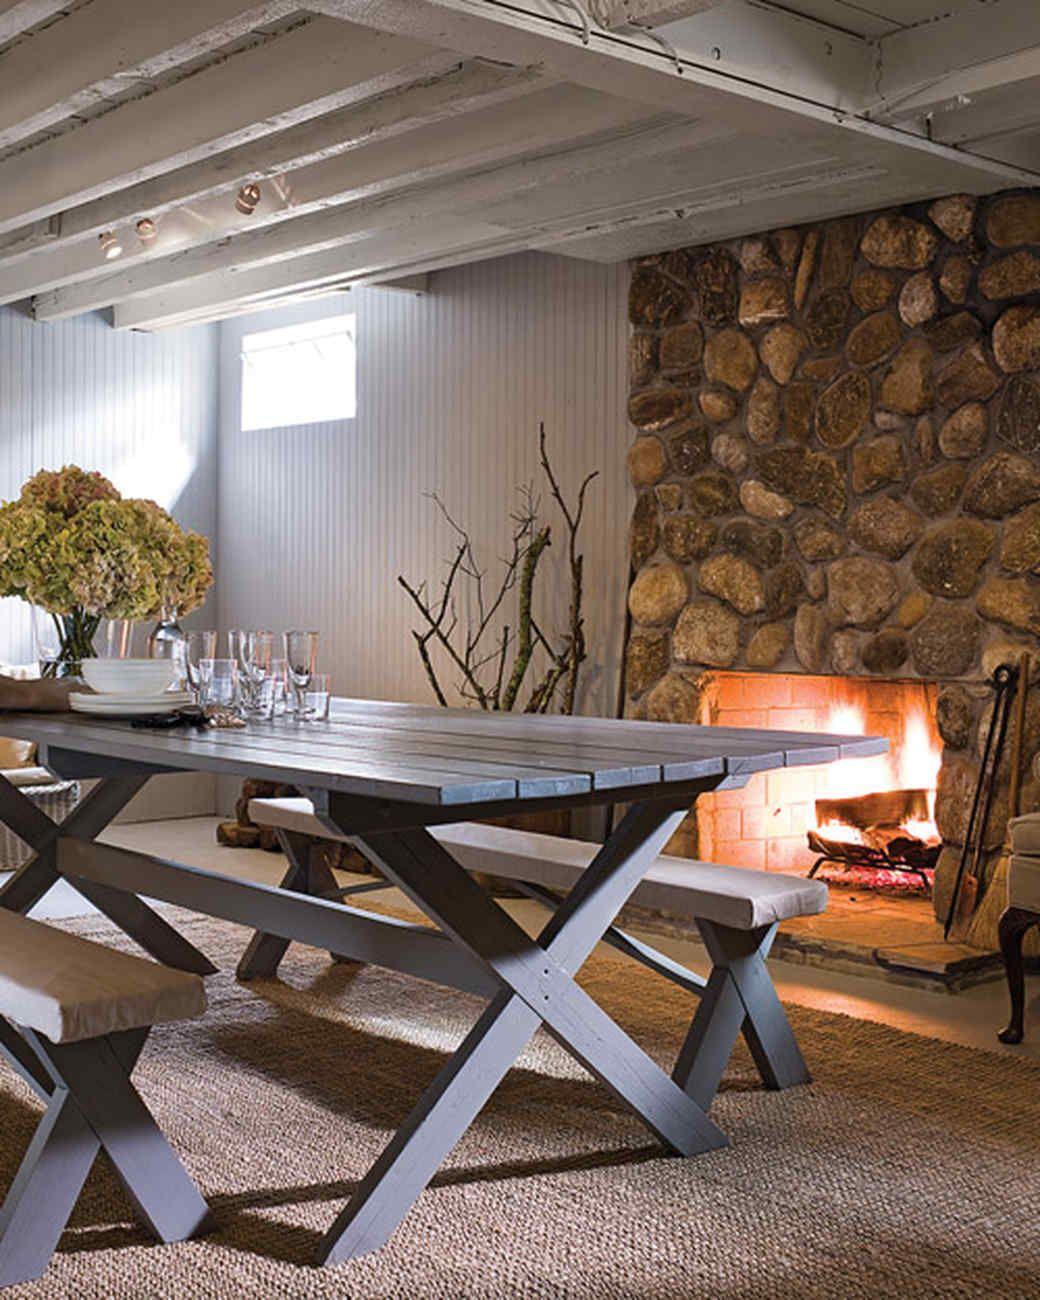 Designer Basements: A Cozy Basement Renovation